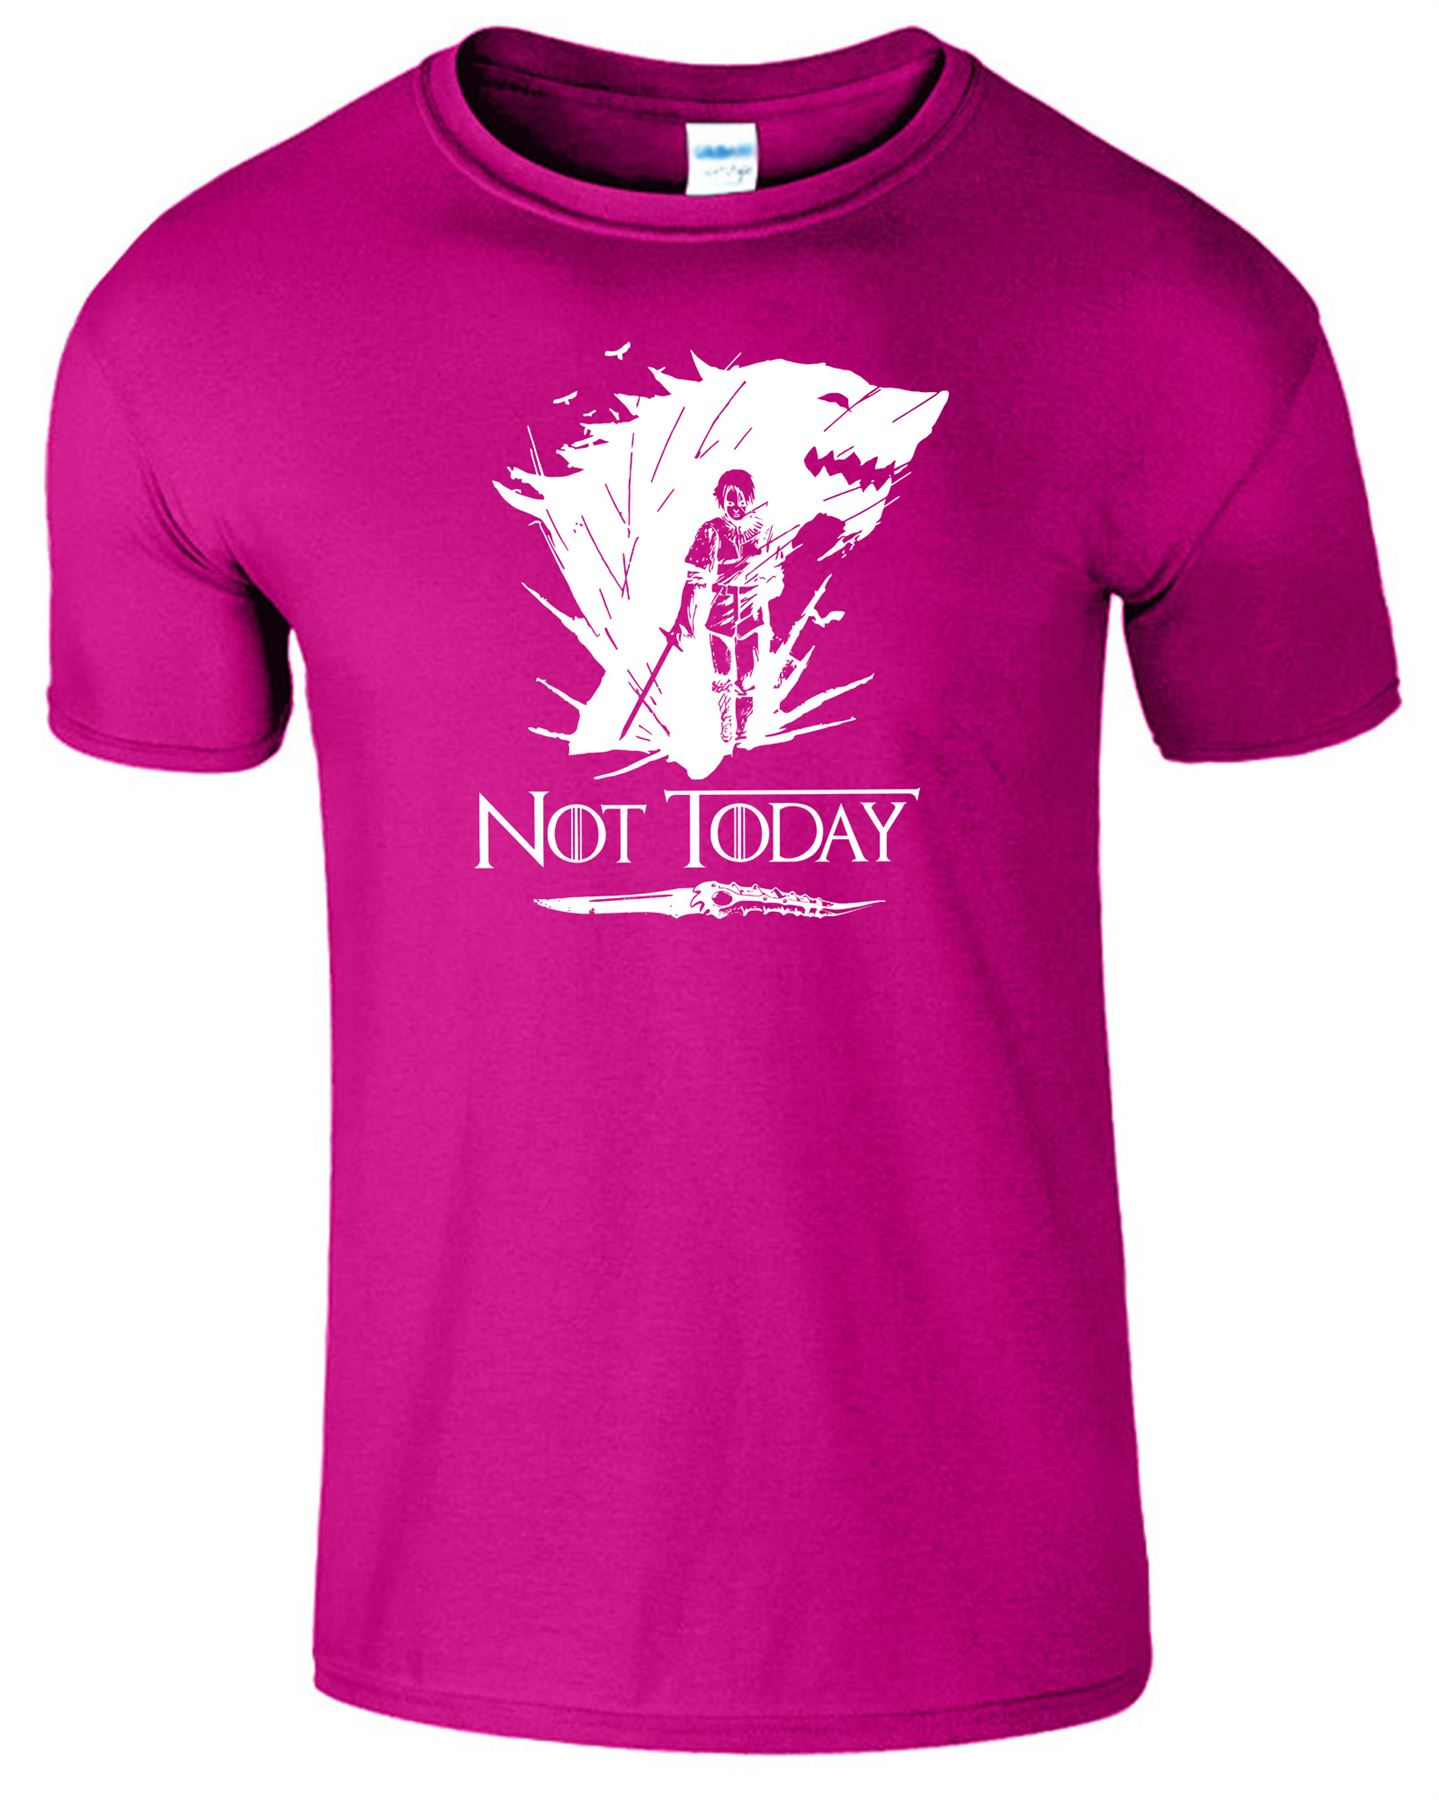 Arya Stark Not Today T-Shirt Mens Game Season Womens Shirt Adults Unisex Fit